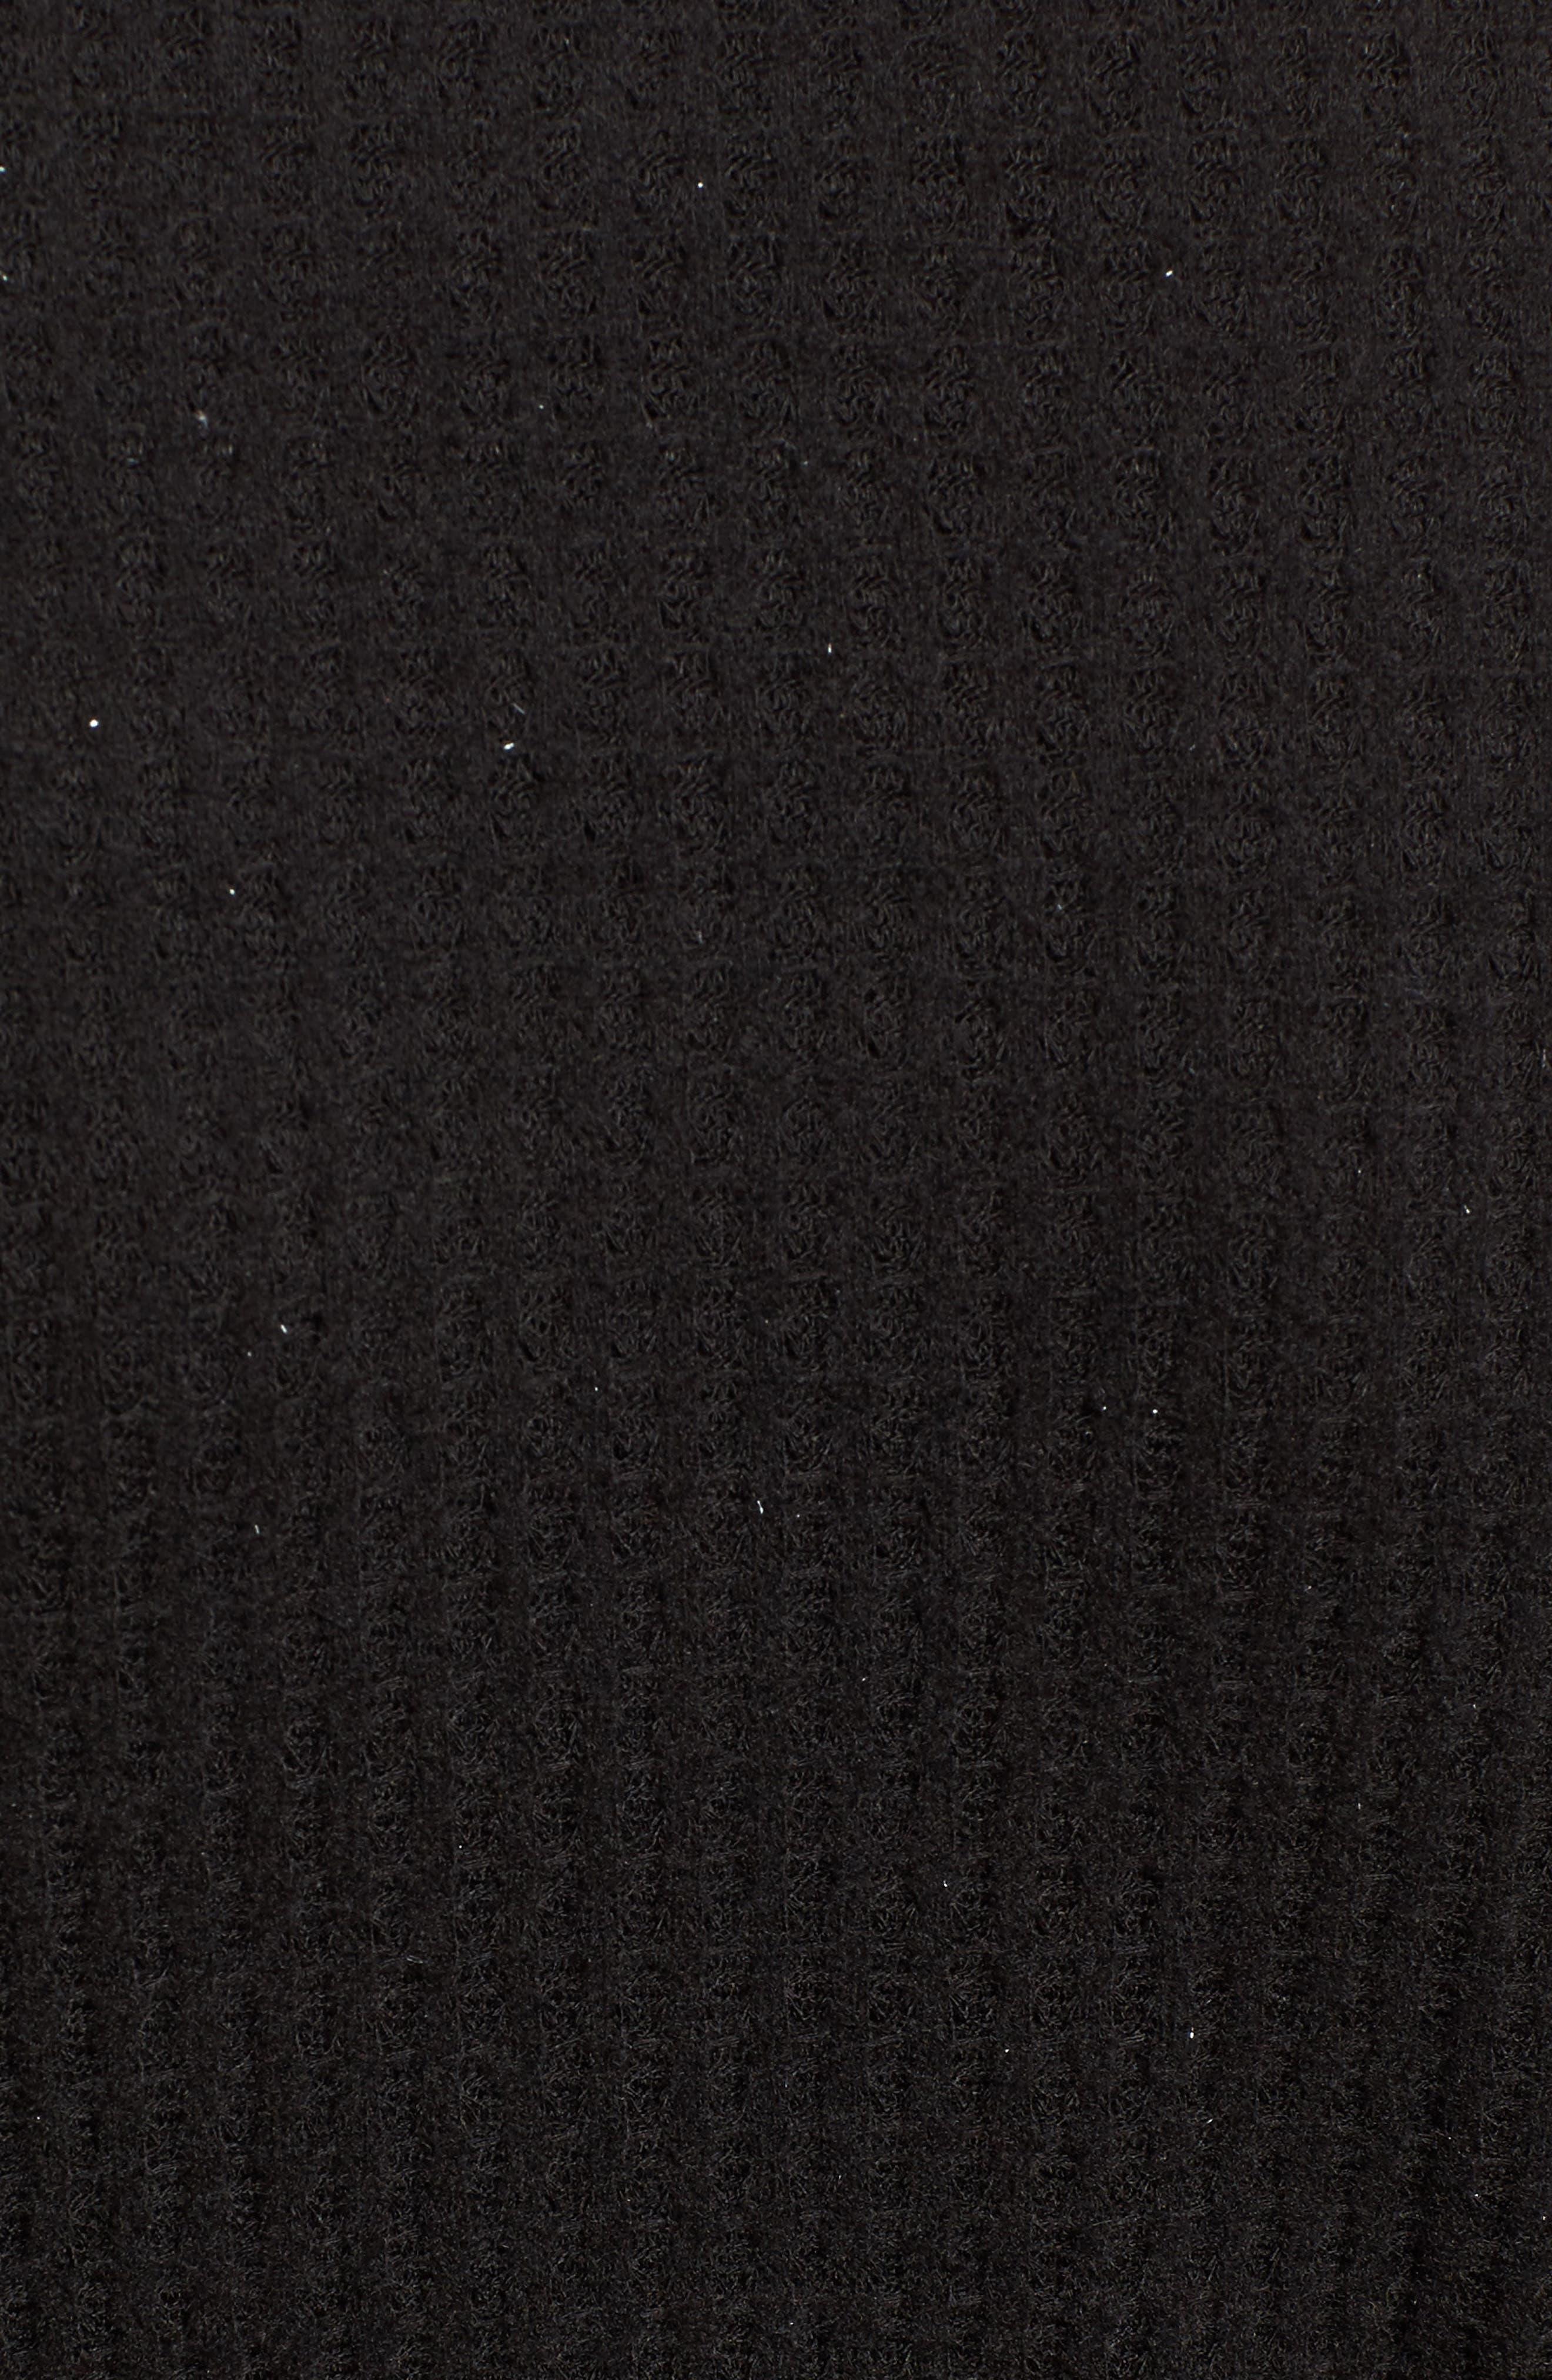 Wrap Sweater,                             Alternate thumbnail 5, color,                             001